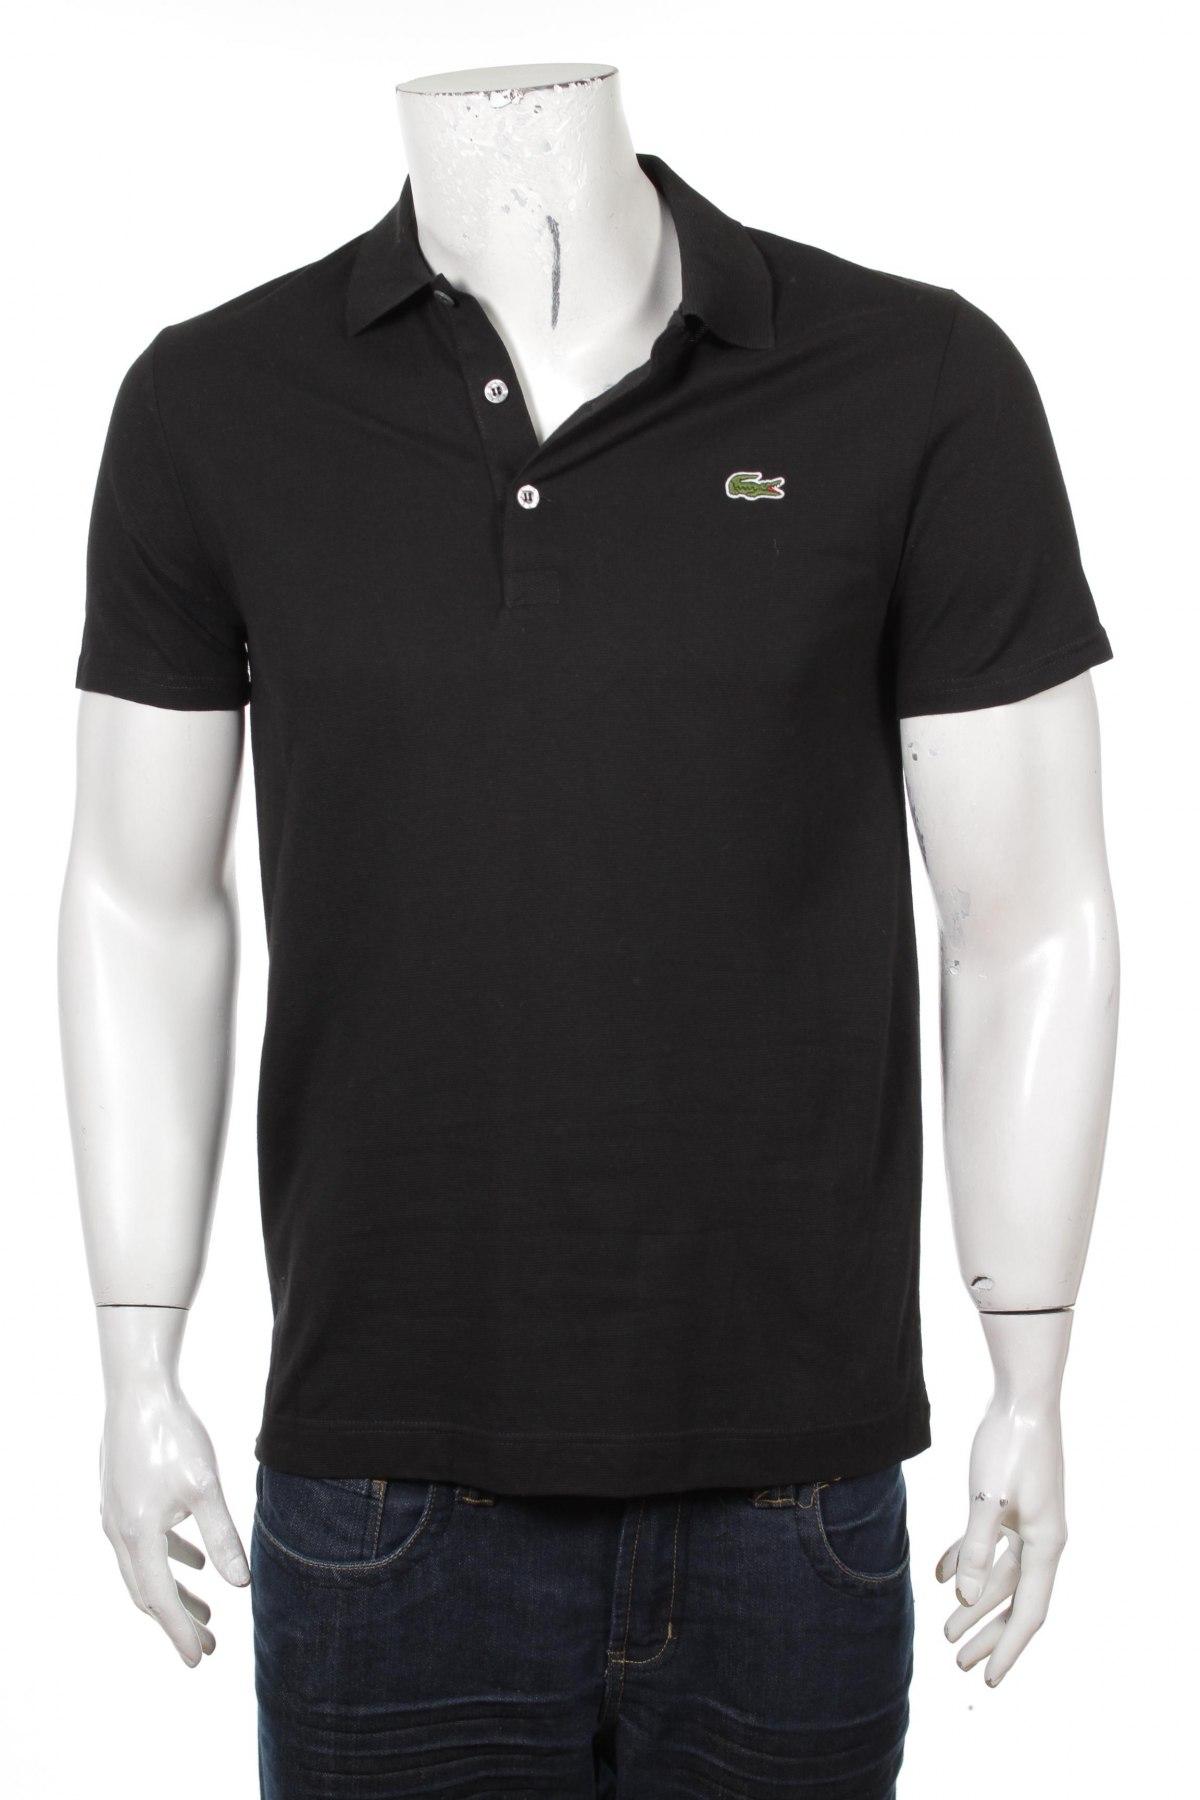 f18b8099b961 Ανδρικό t-shirt Lacoste - σε συμφέρουσα τιμή στο Remix -  8253592